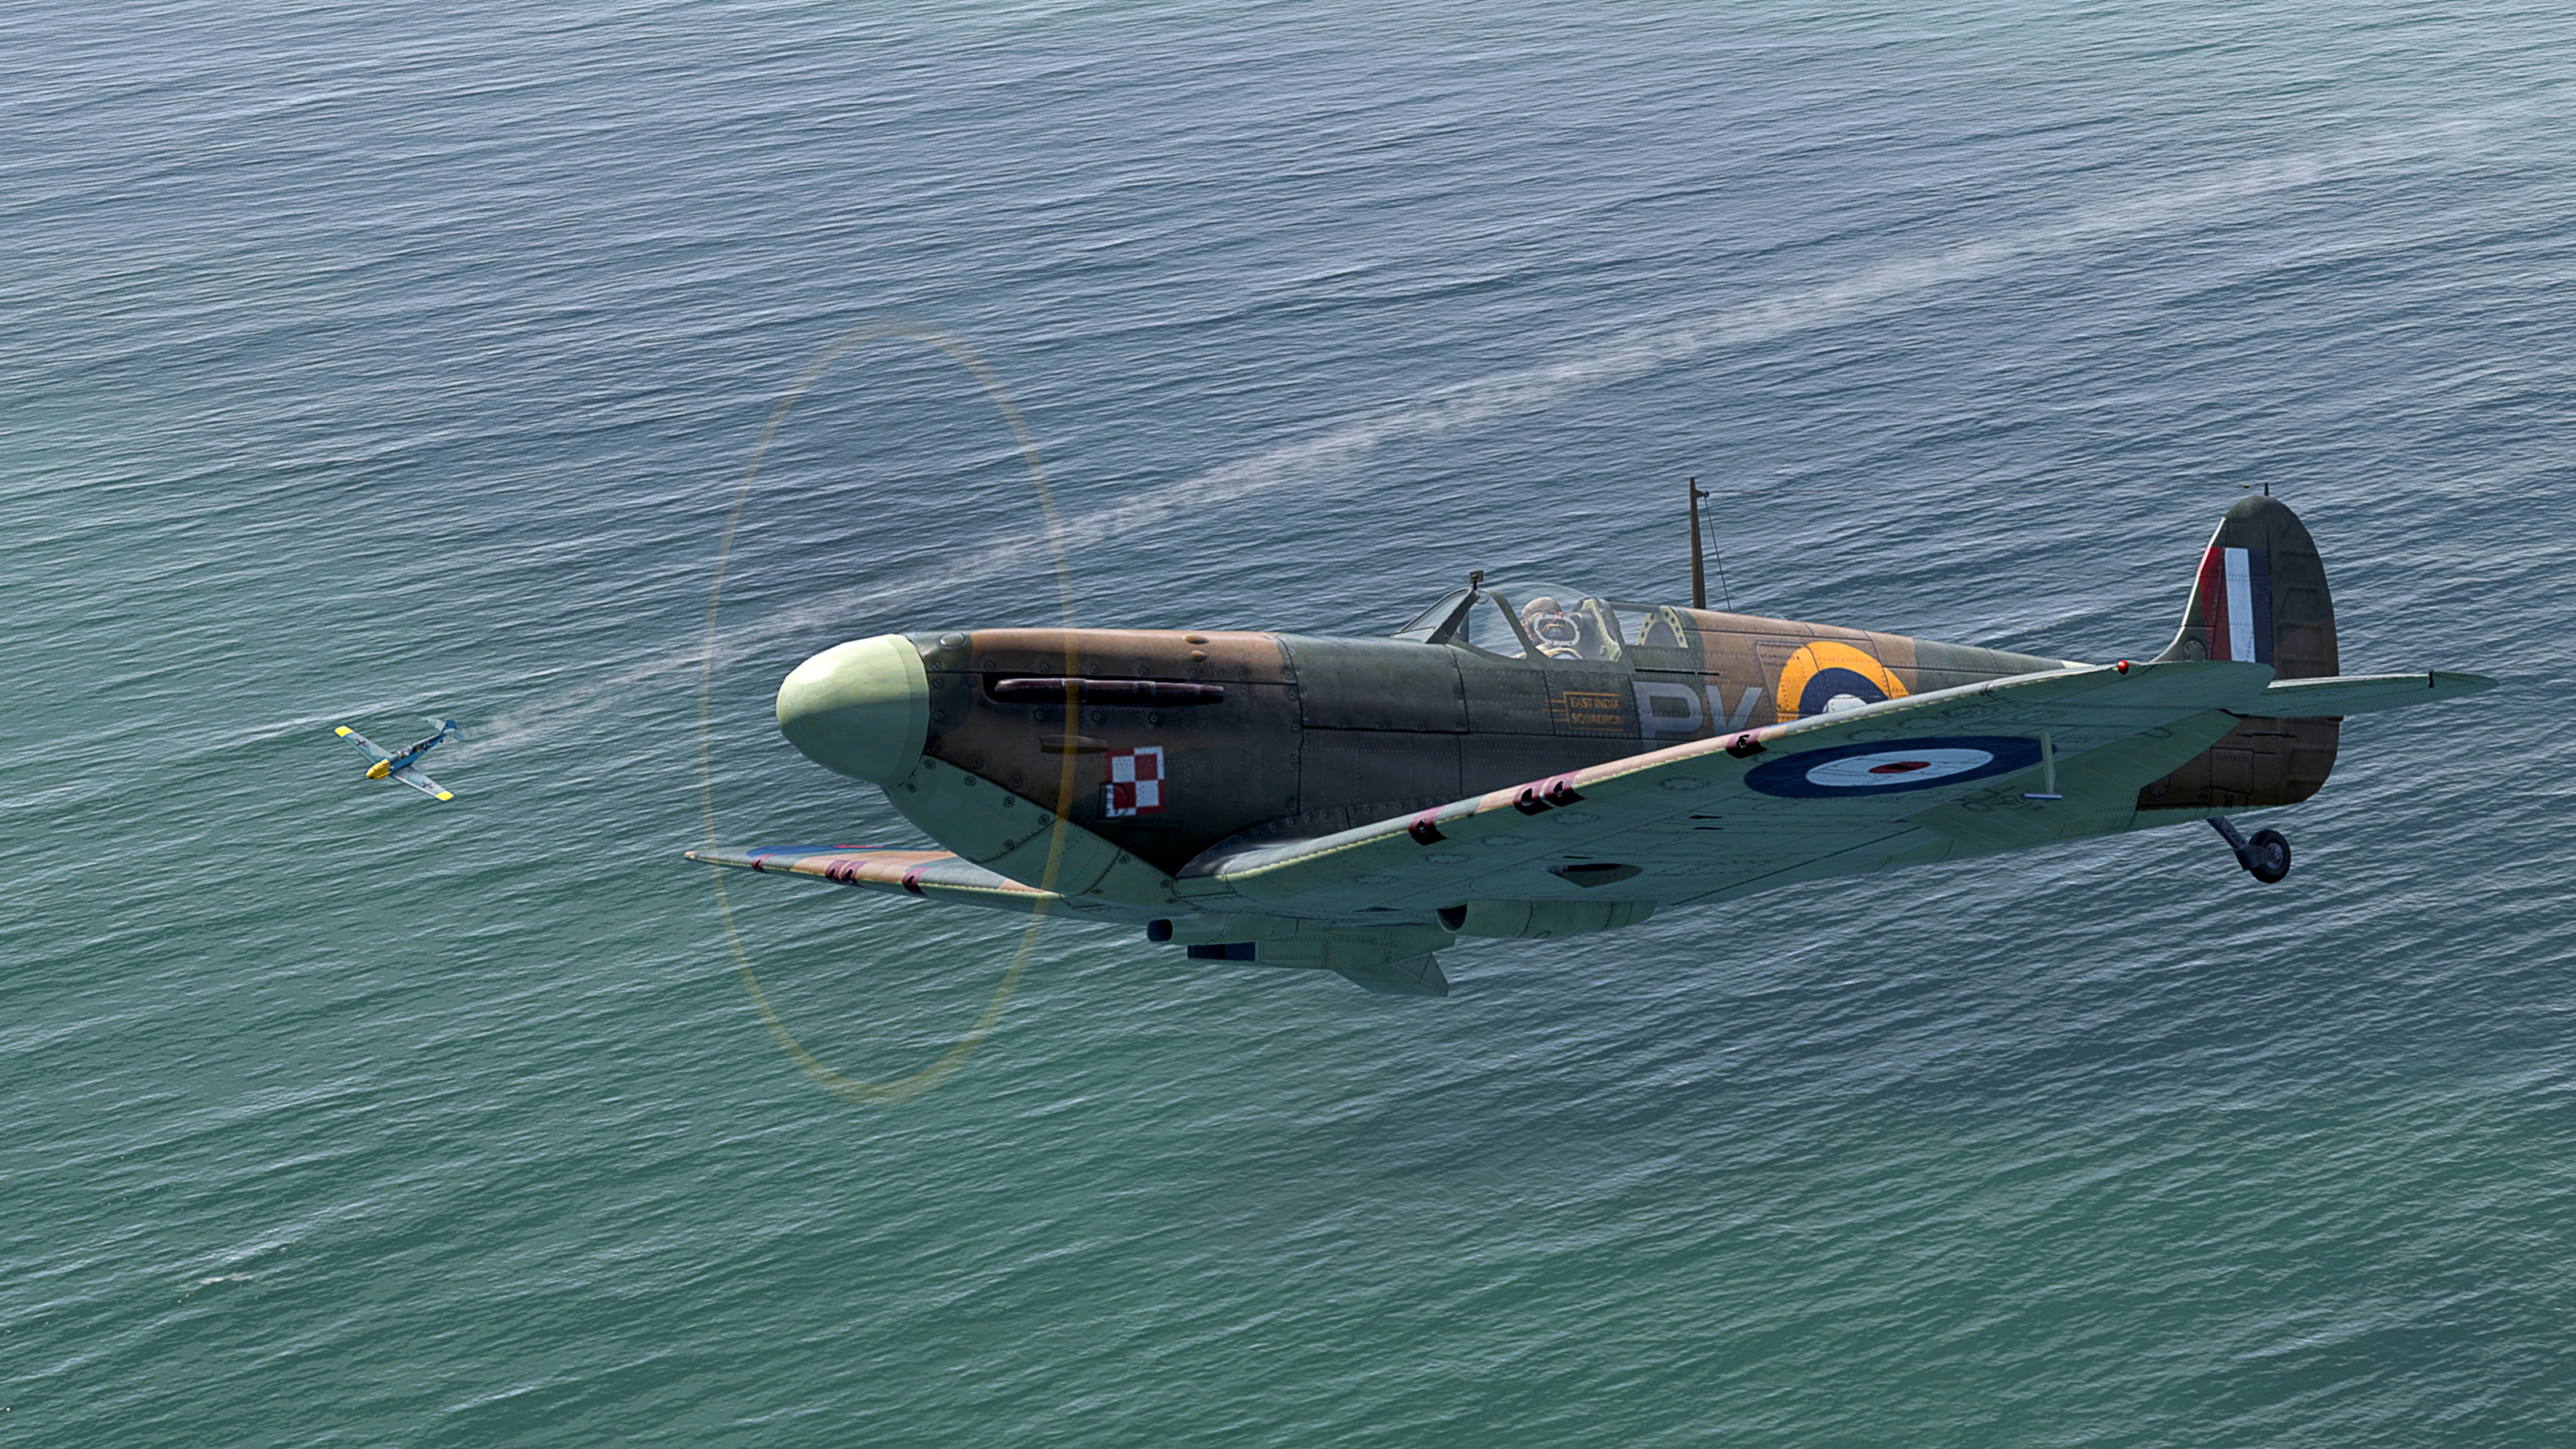 COD KF MkII RAF 315Sqn PKH P8387 Northolt England July 1941 V02